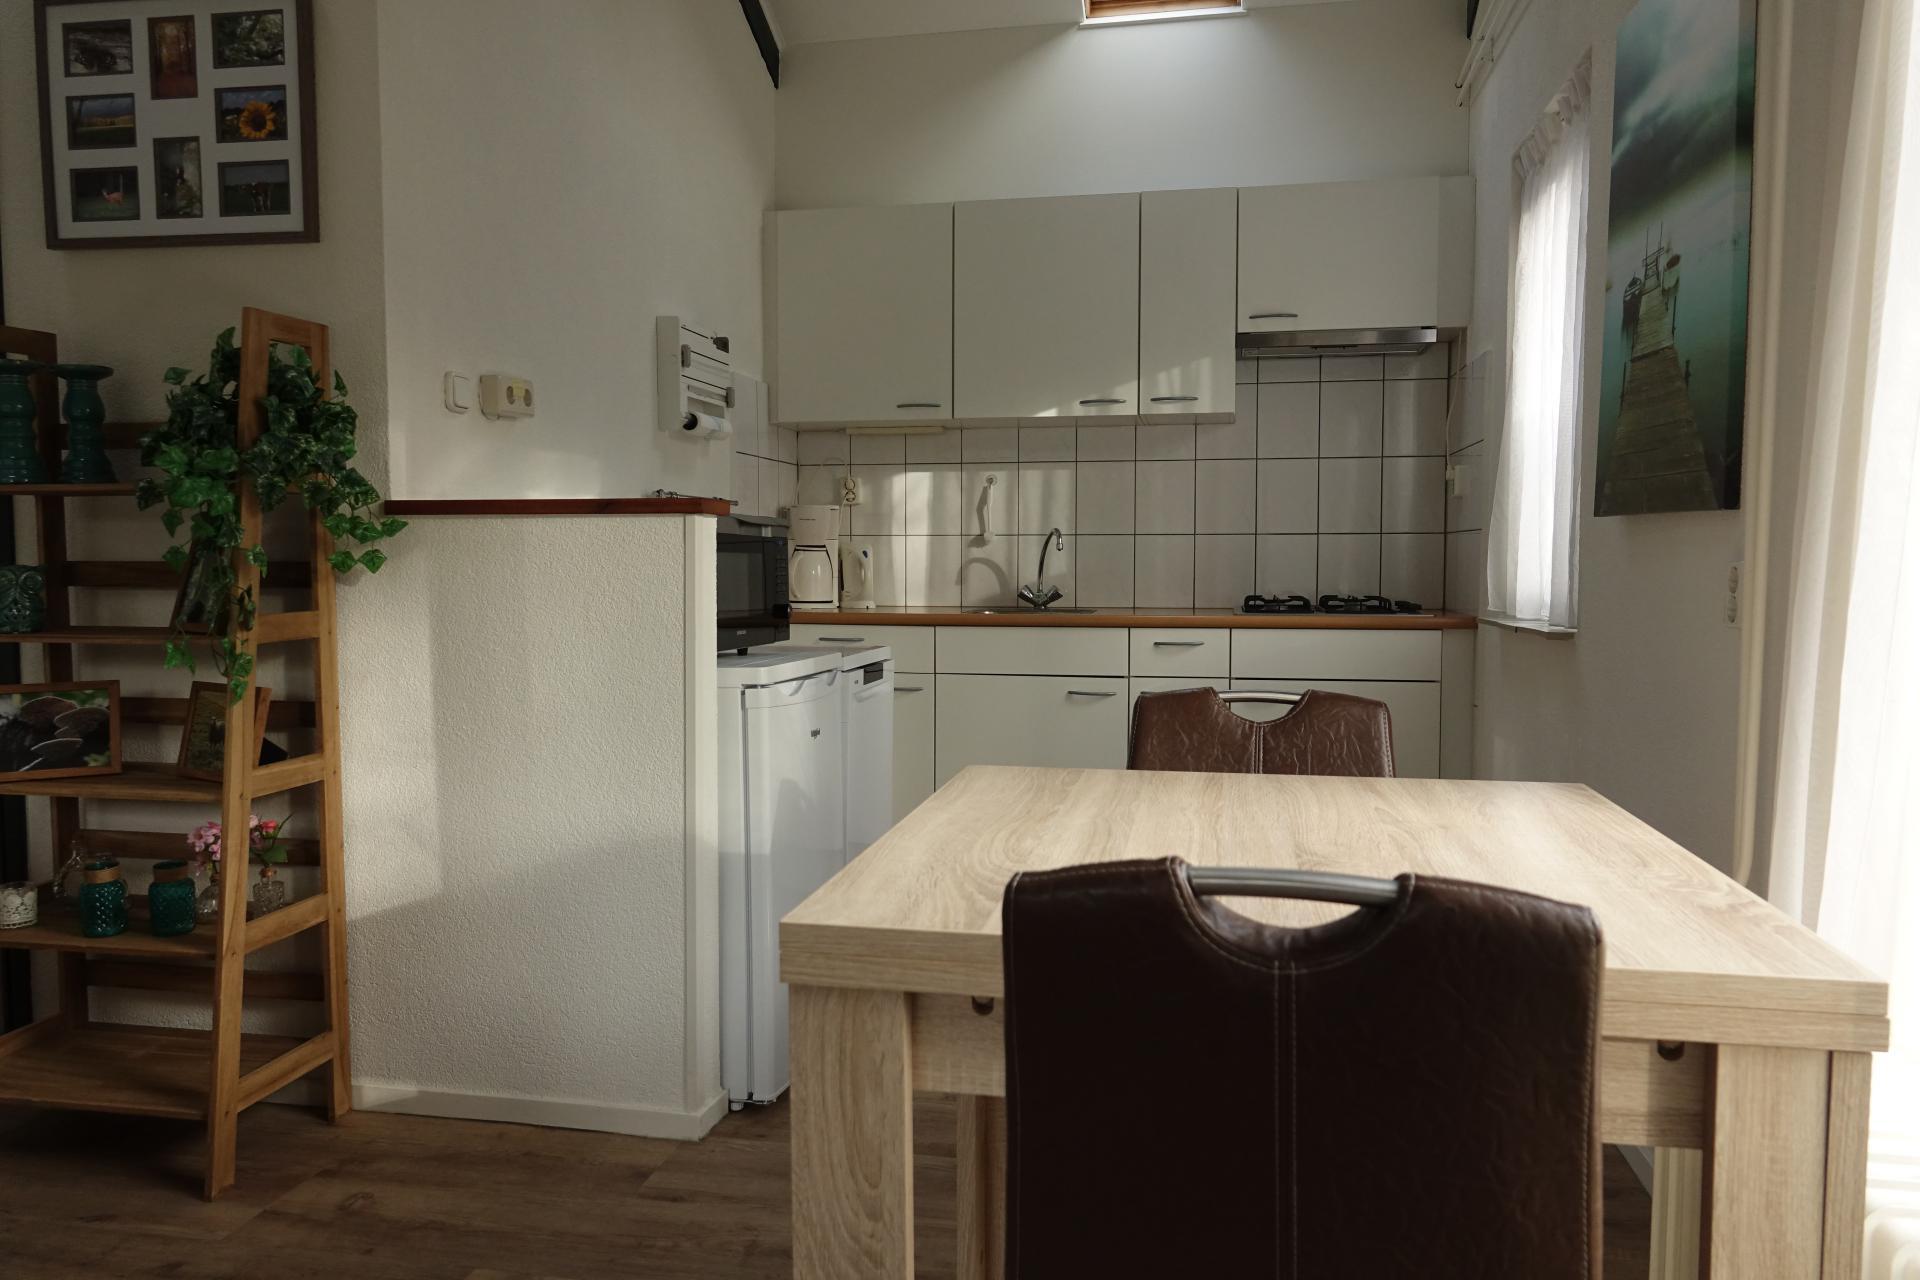 Eethoek-keuken106